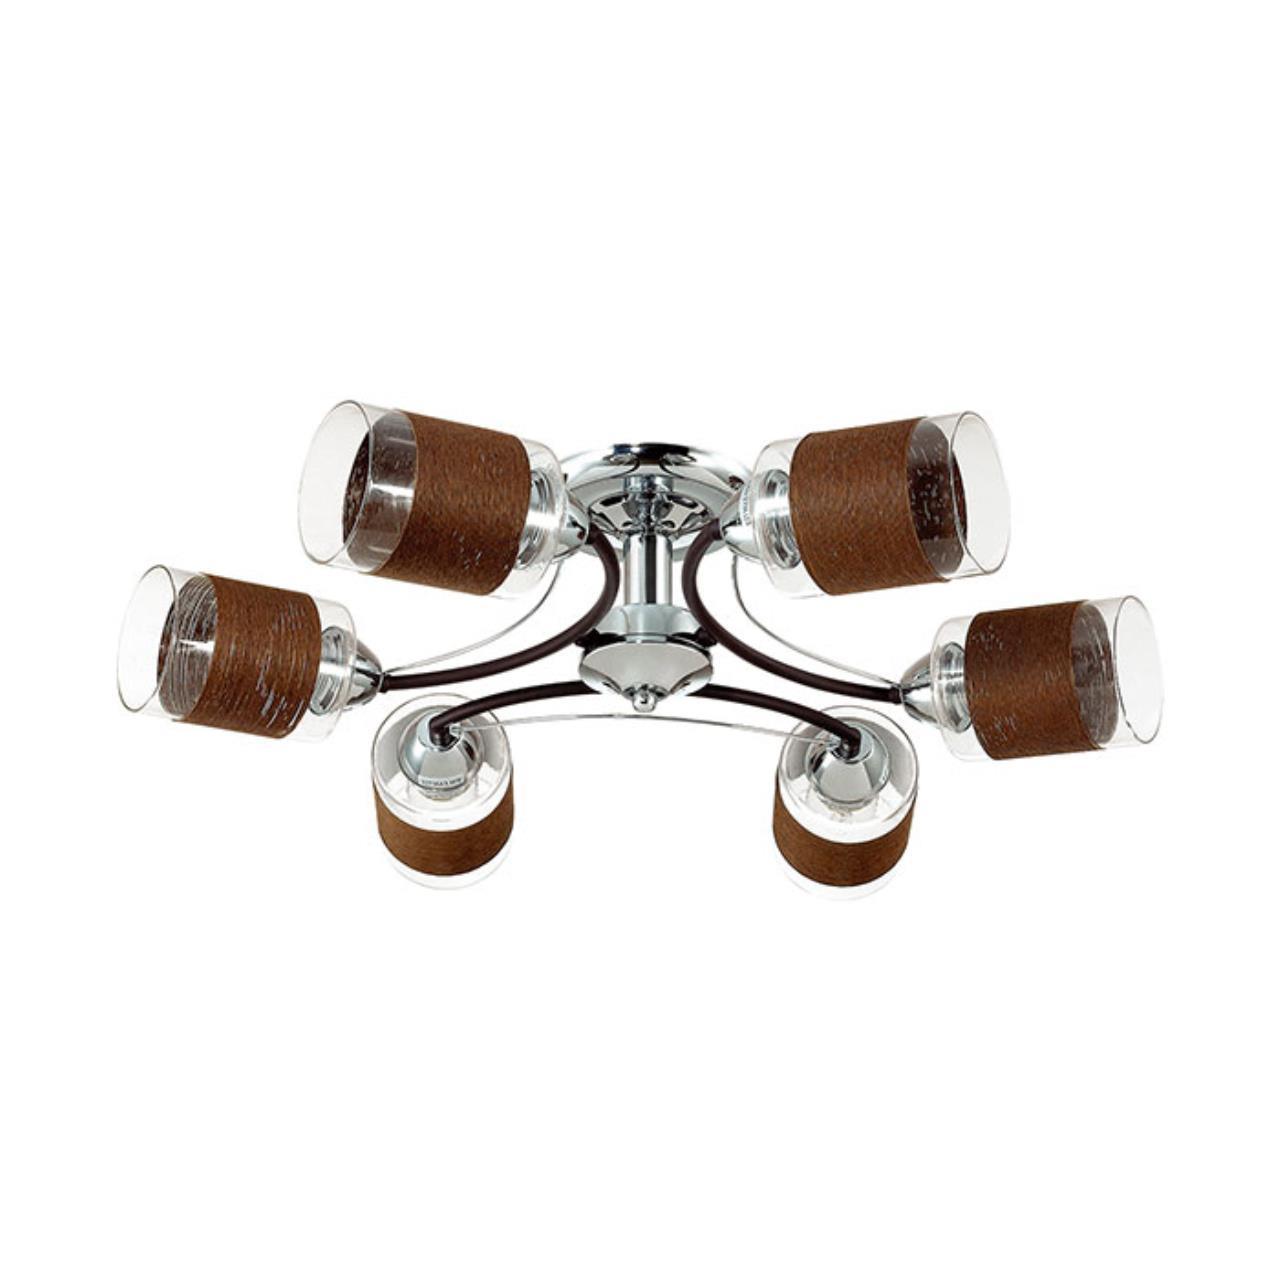 3030/6C COMFI LN16 170 хром/кофе/стекло/декор.тесьма Люстра потолочная E27 6*60W 220V FILLA